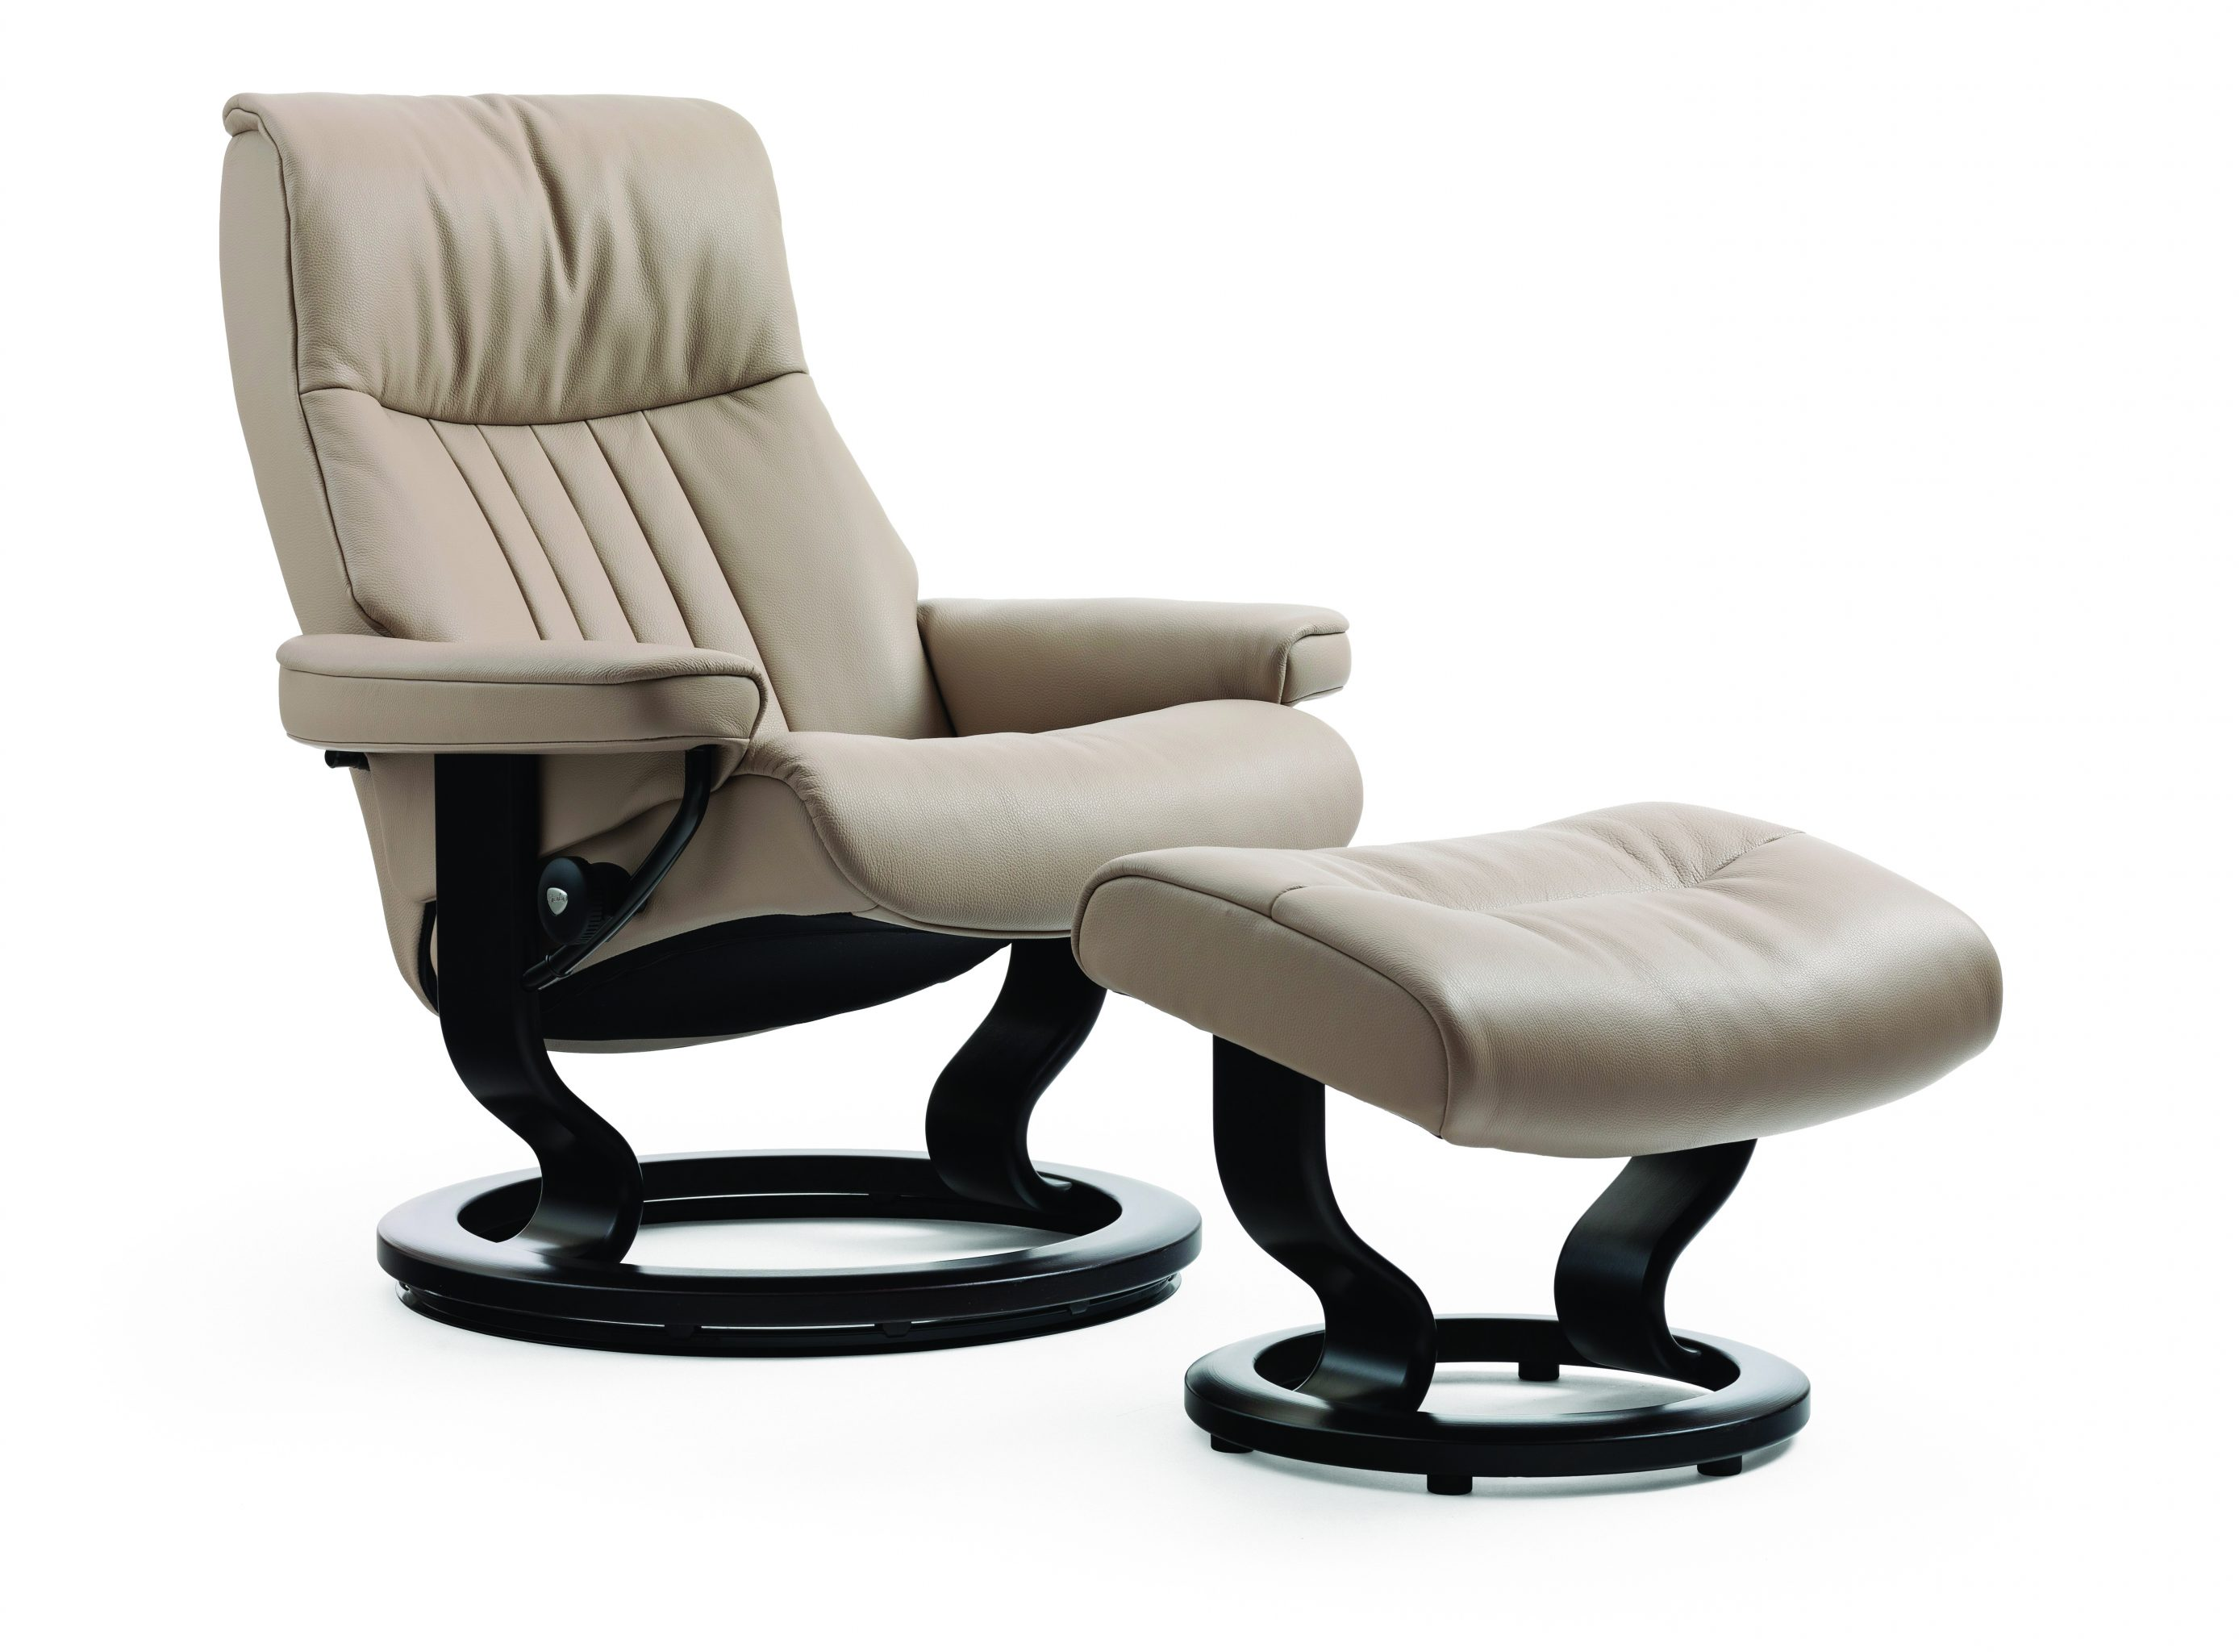 Stressless Crown Chair & Ottoman LaDiff